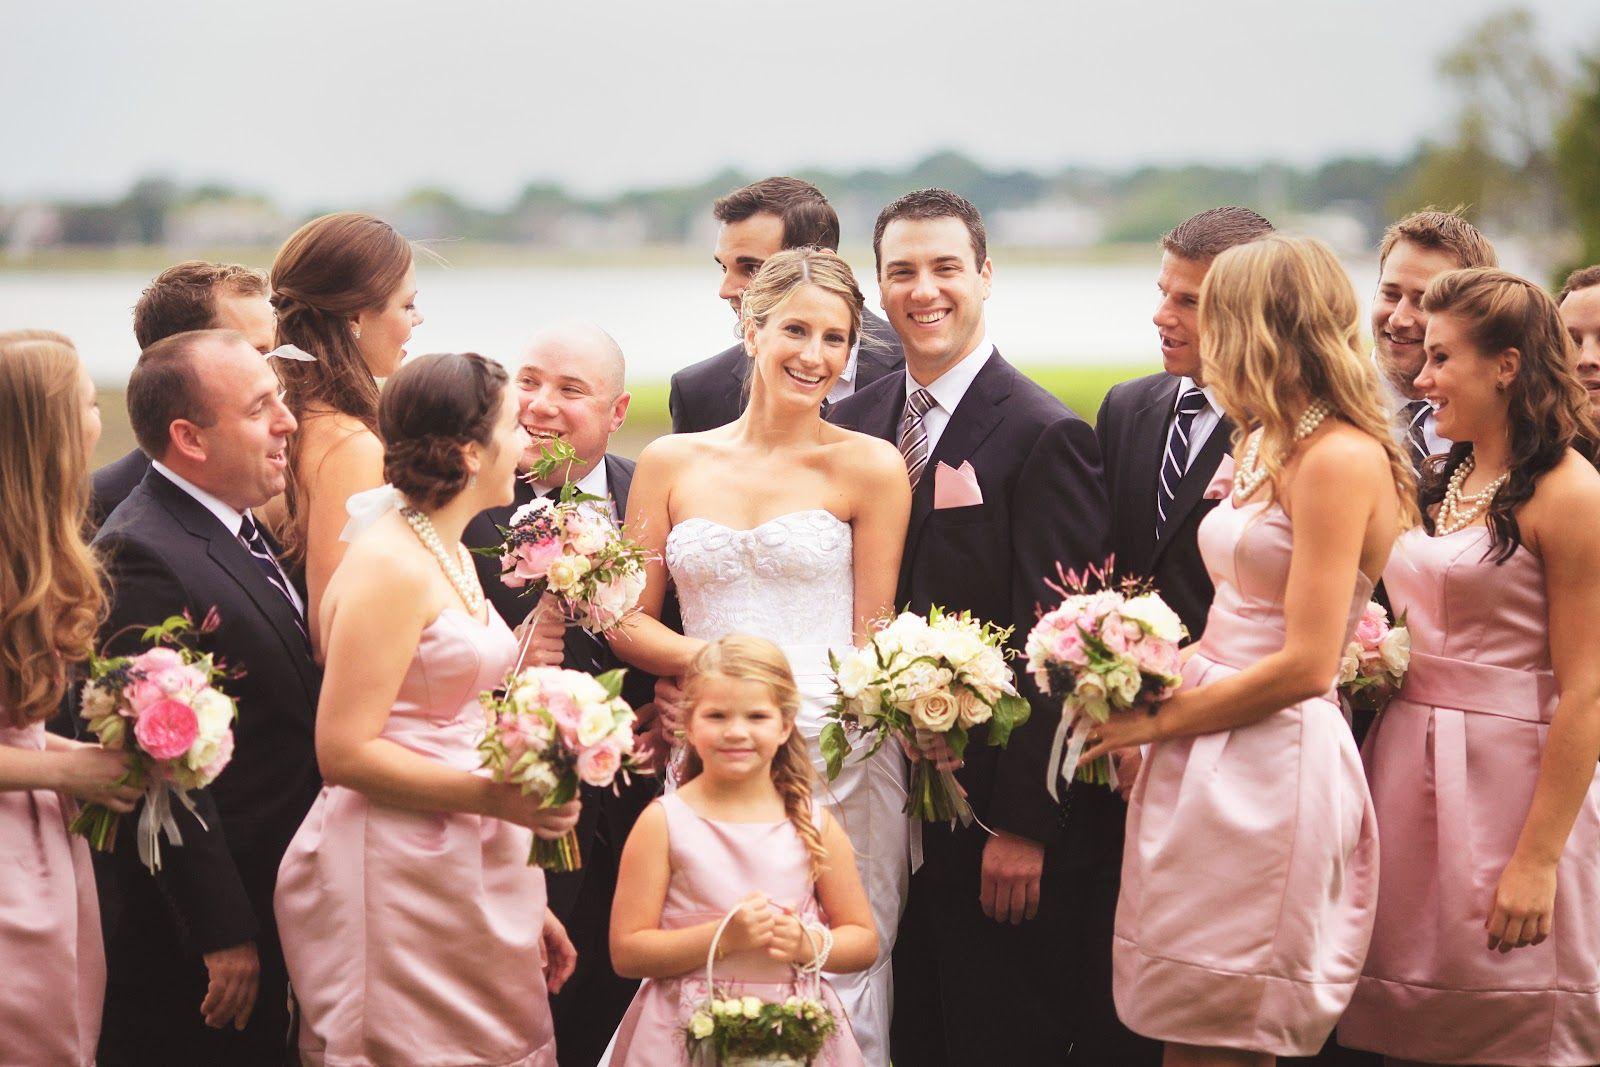 Navy Blush Champagne Wedding | Champagne and Blush Pink Wedding ...